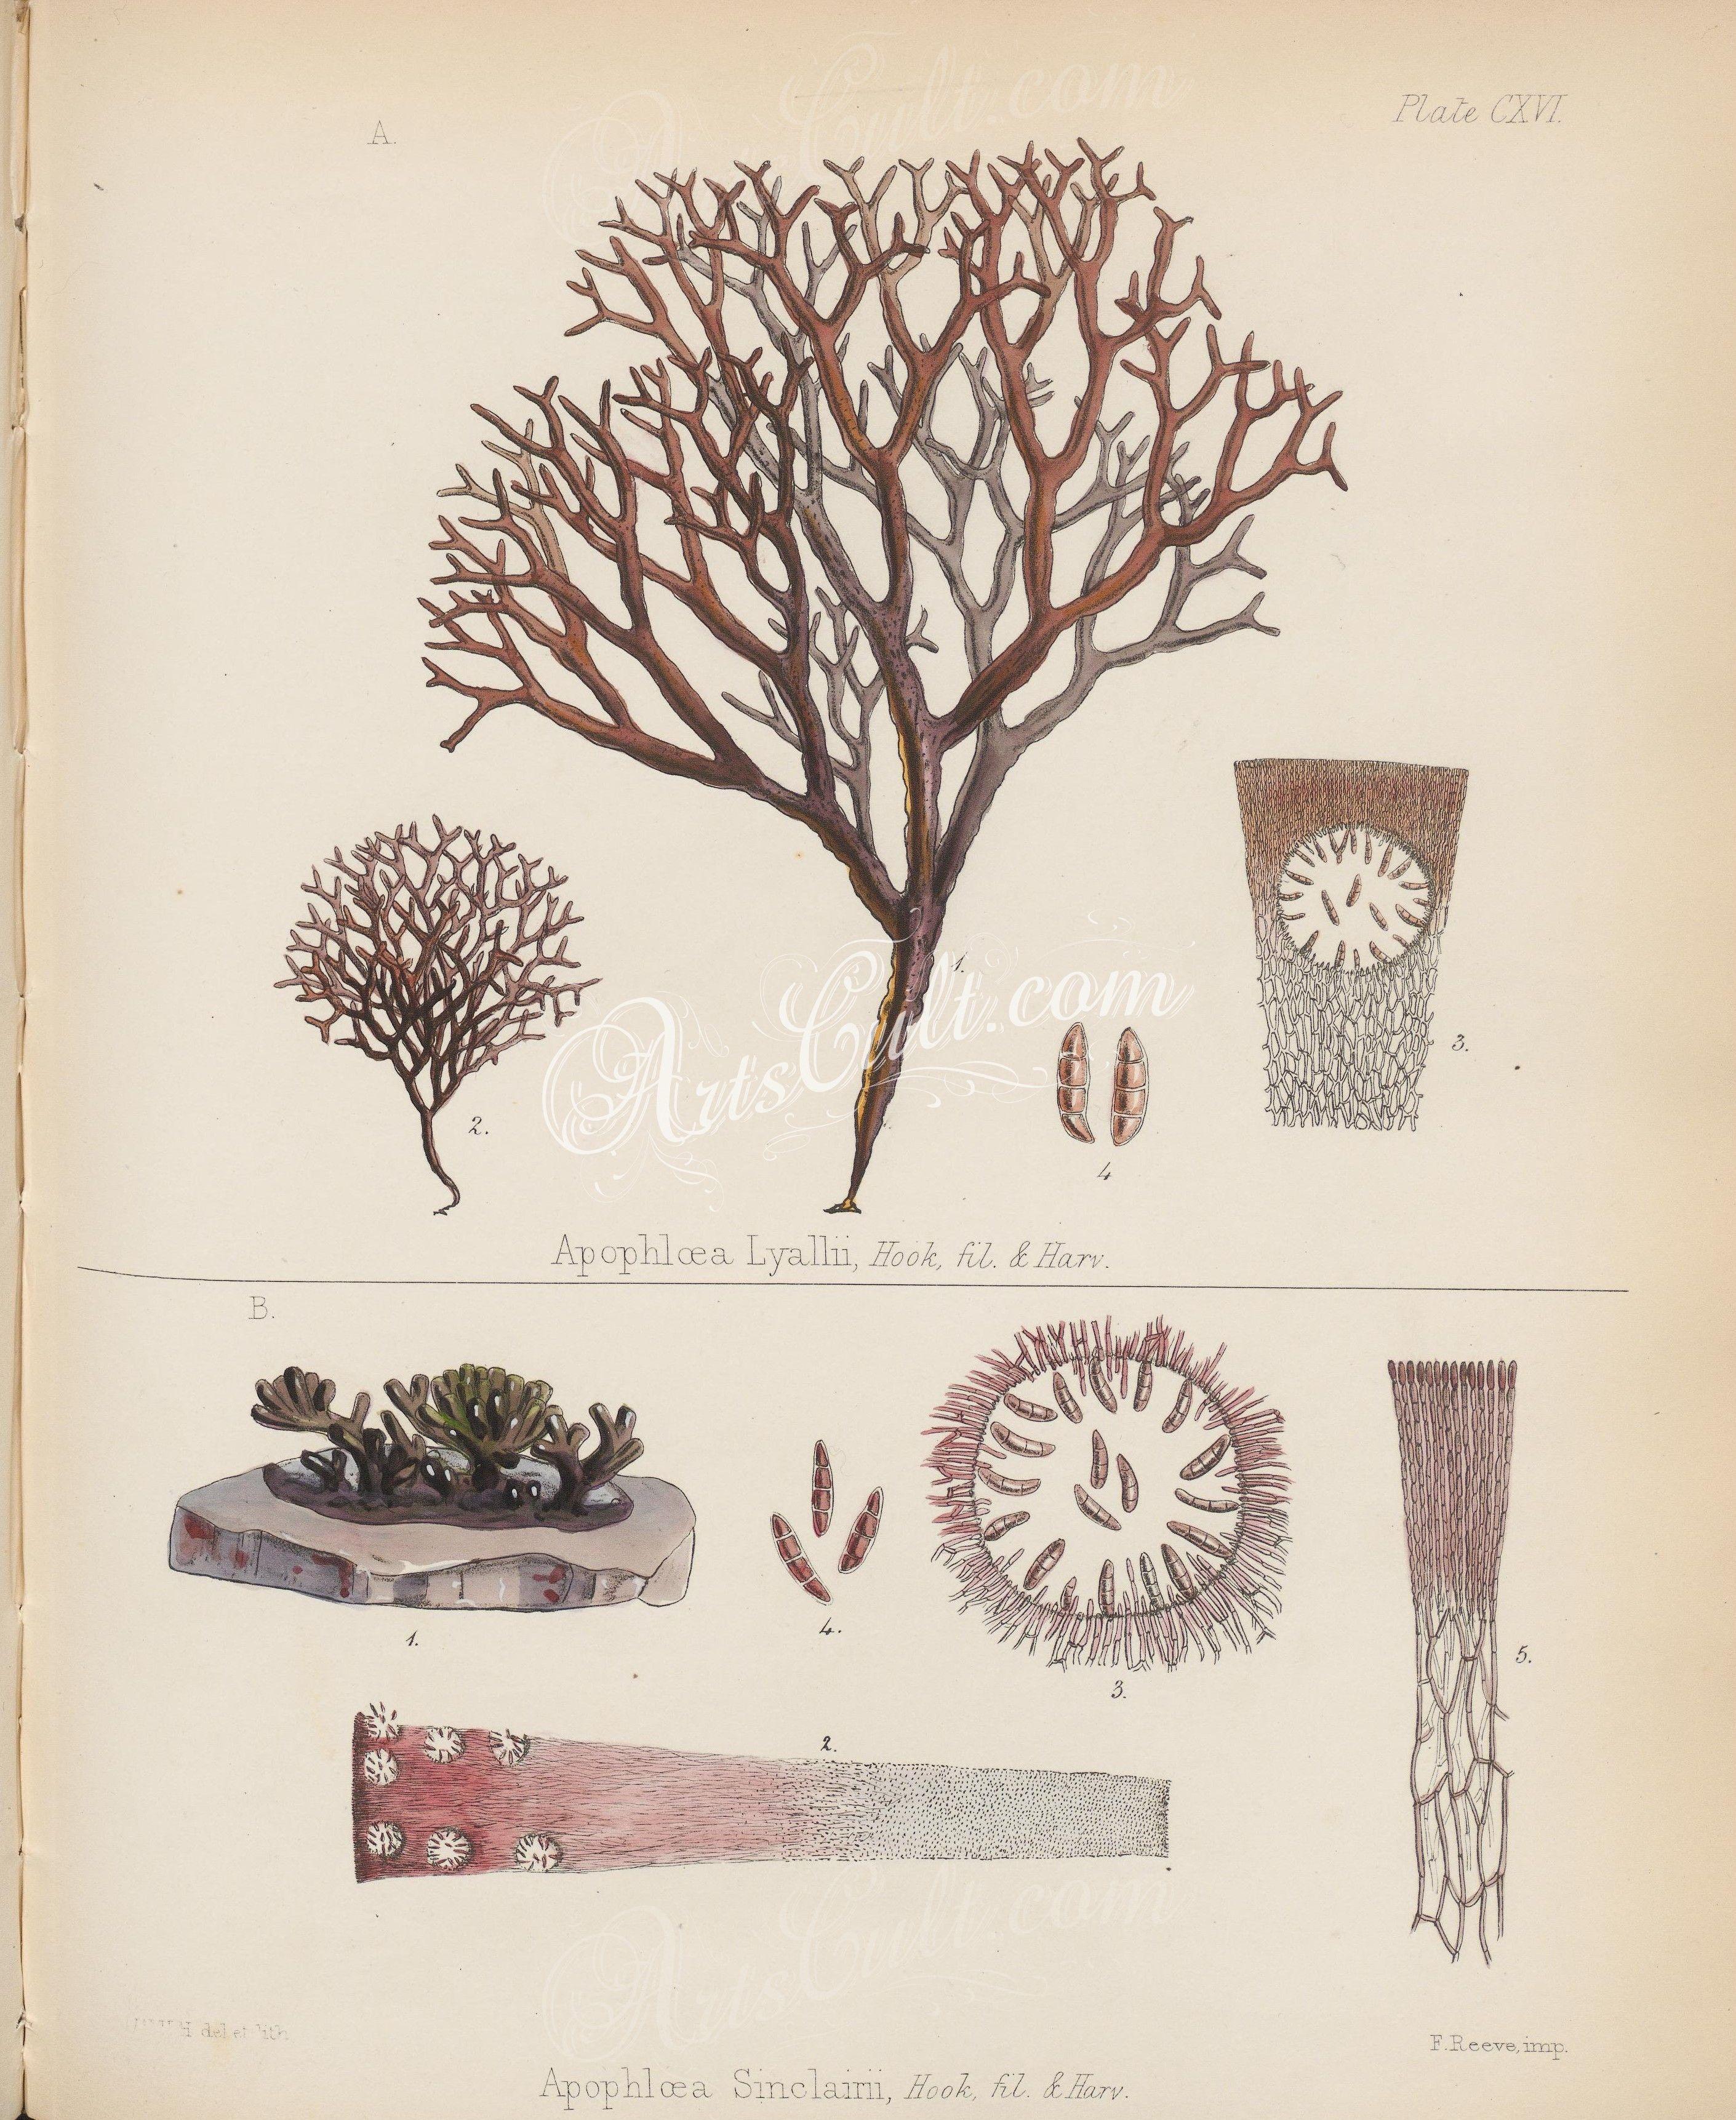 apophloea lyallii, apophloea sinclairii   ...